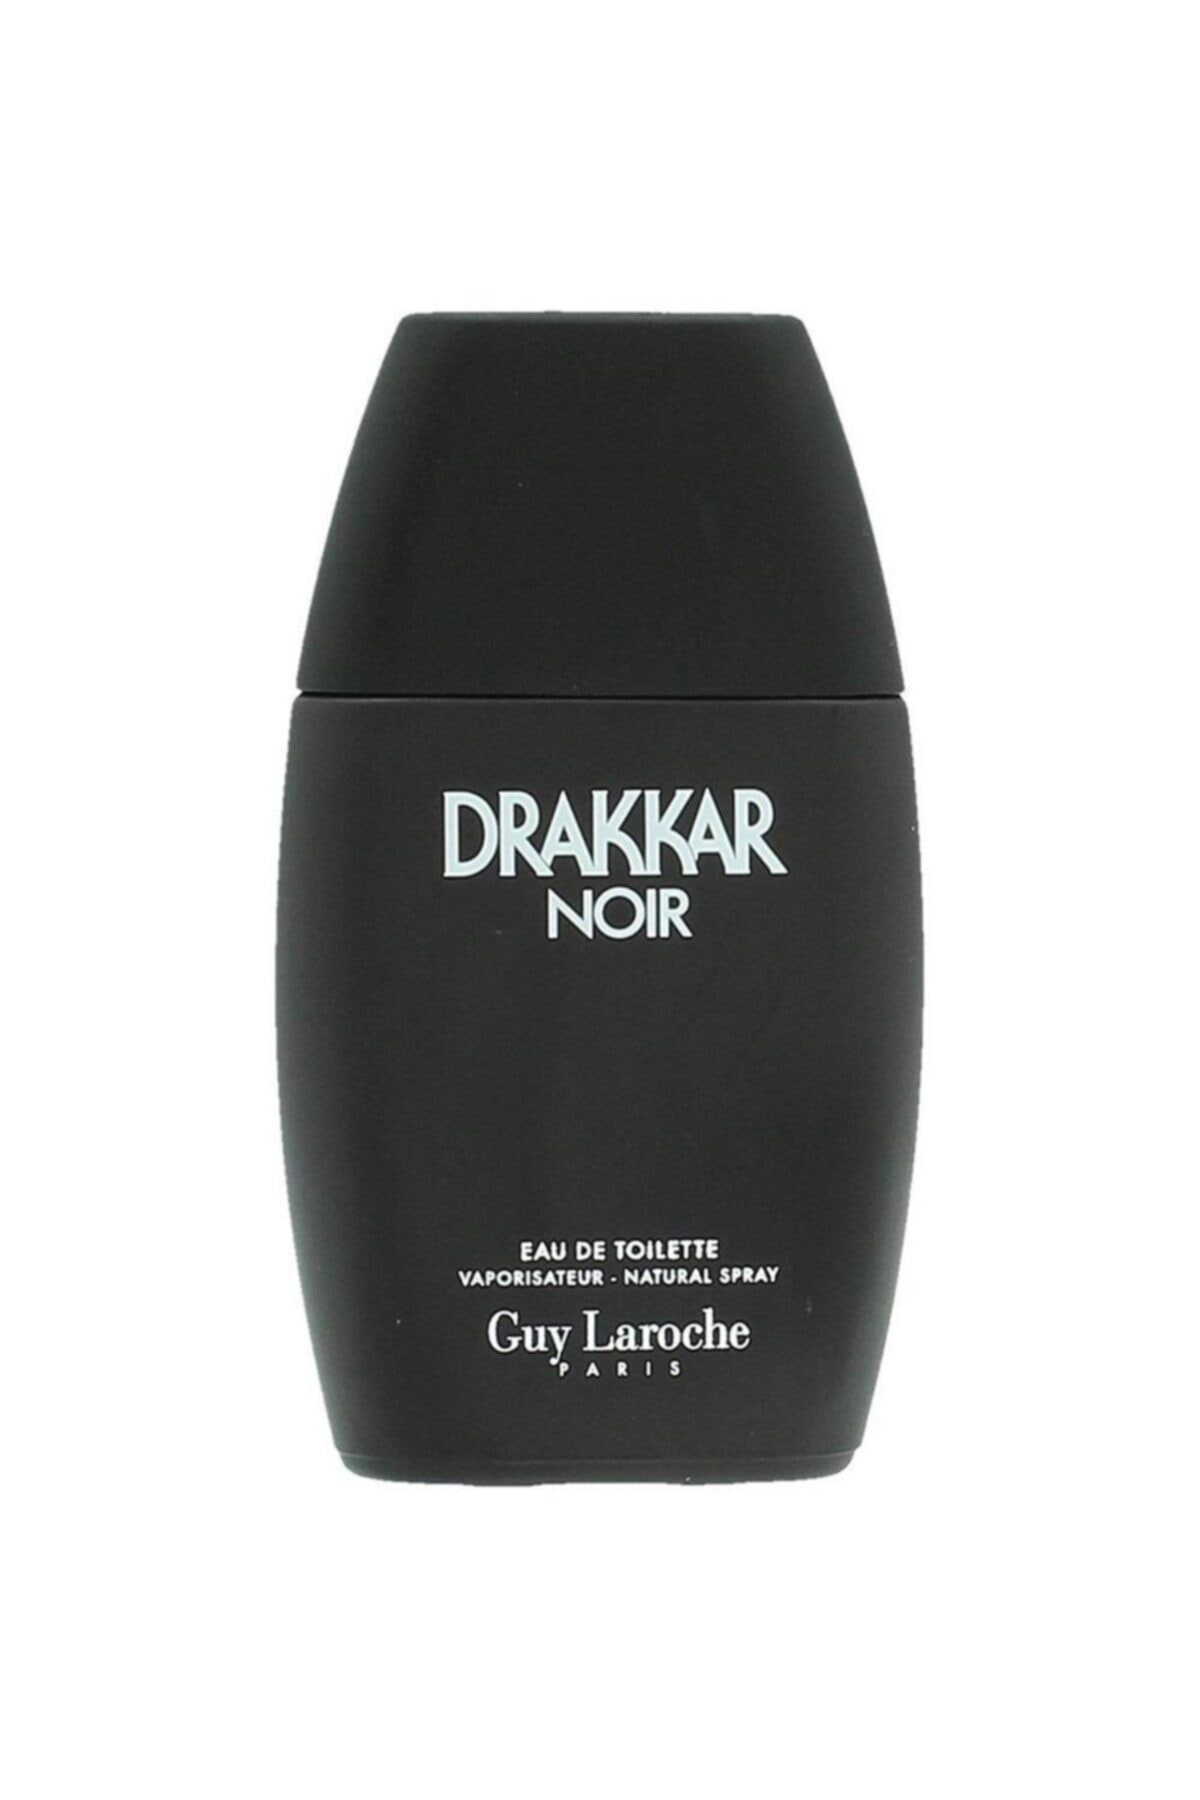 Guy Laoche Drakkar Noir Edt 200 ml Erkek Parfüm  3360372017332 1